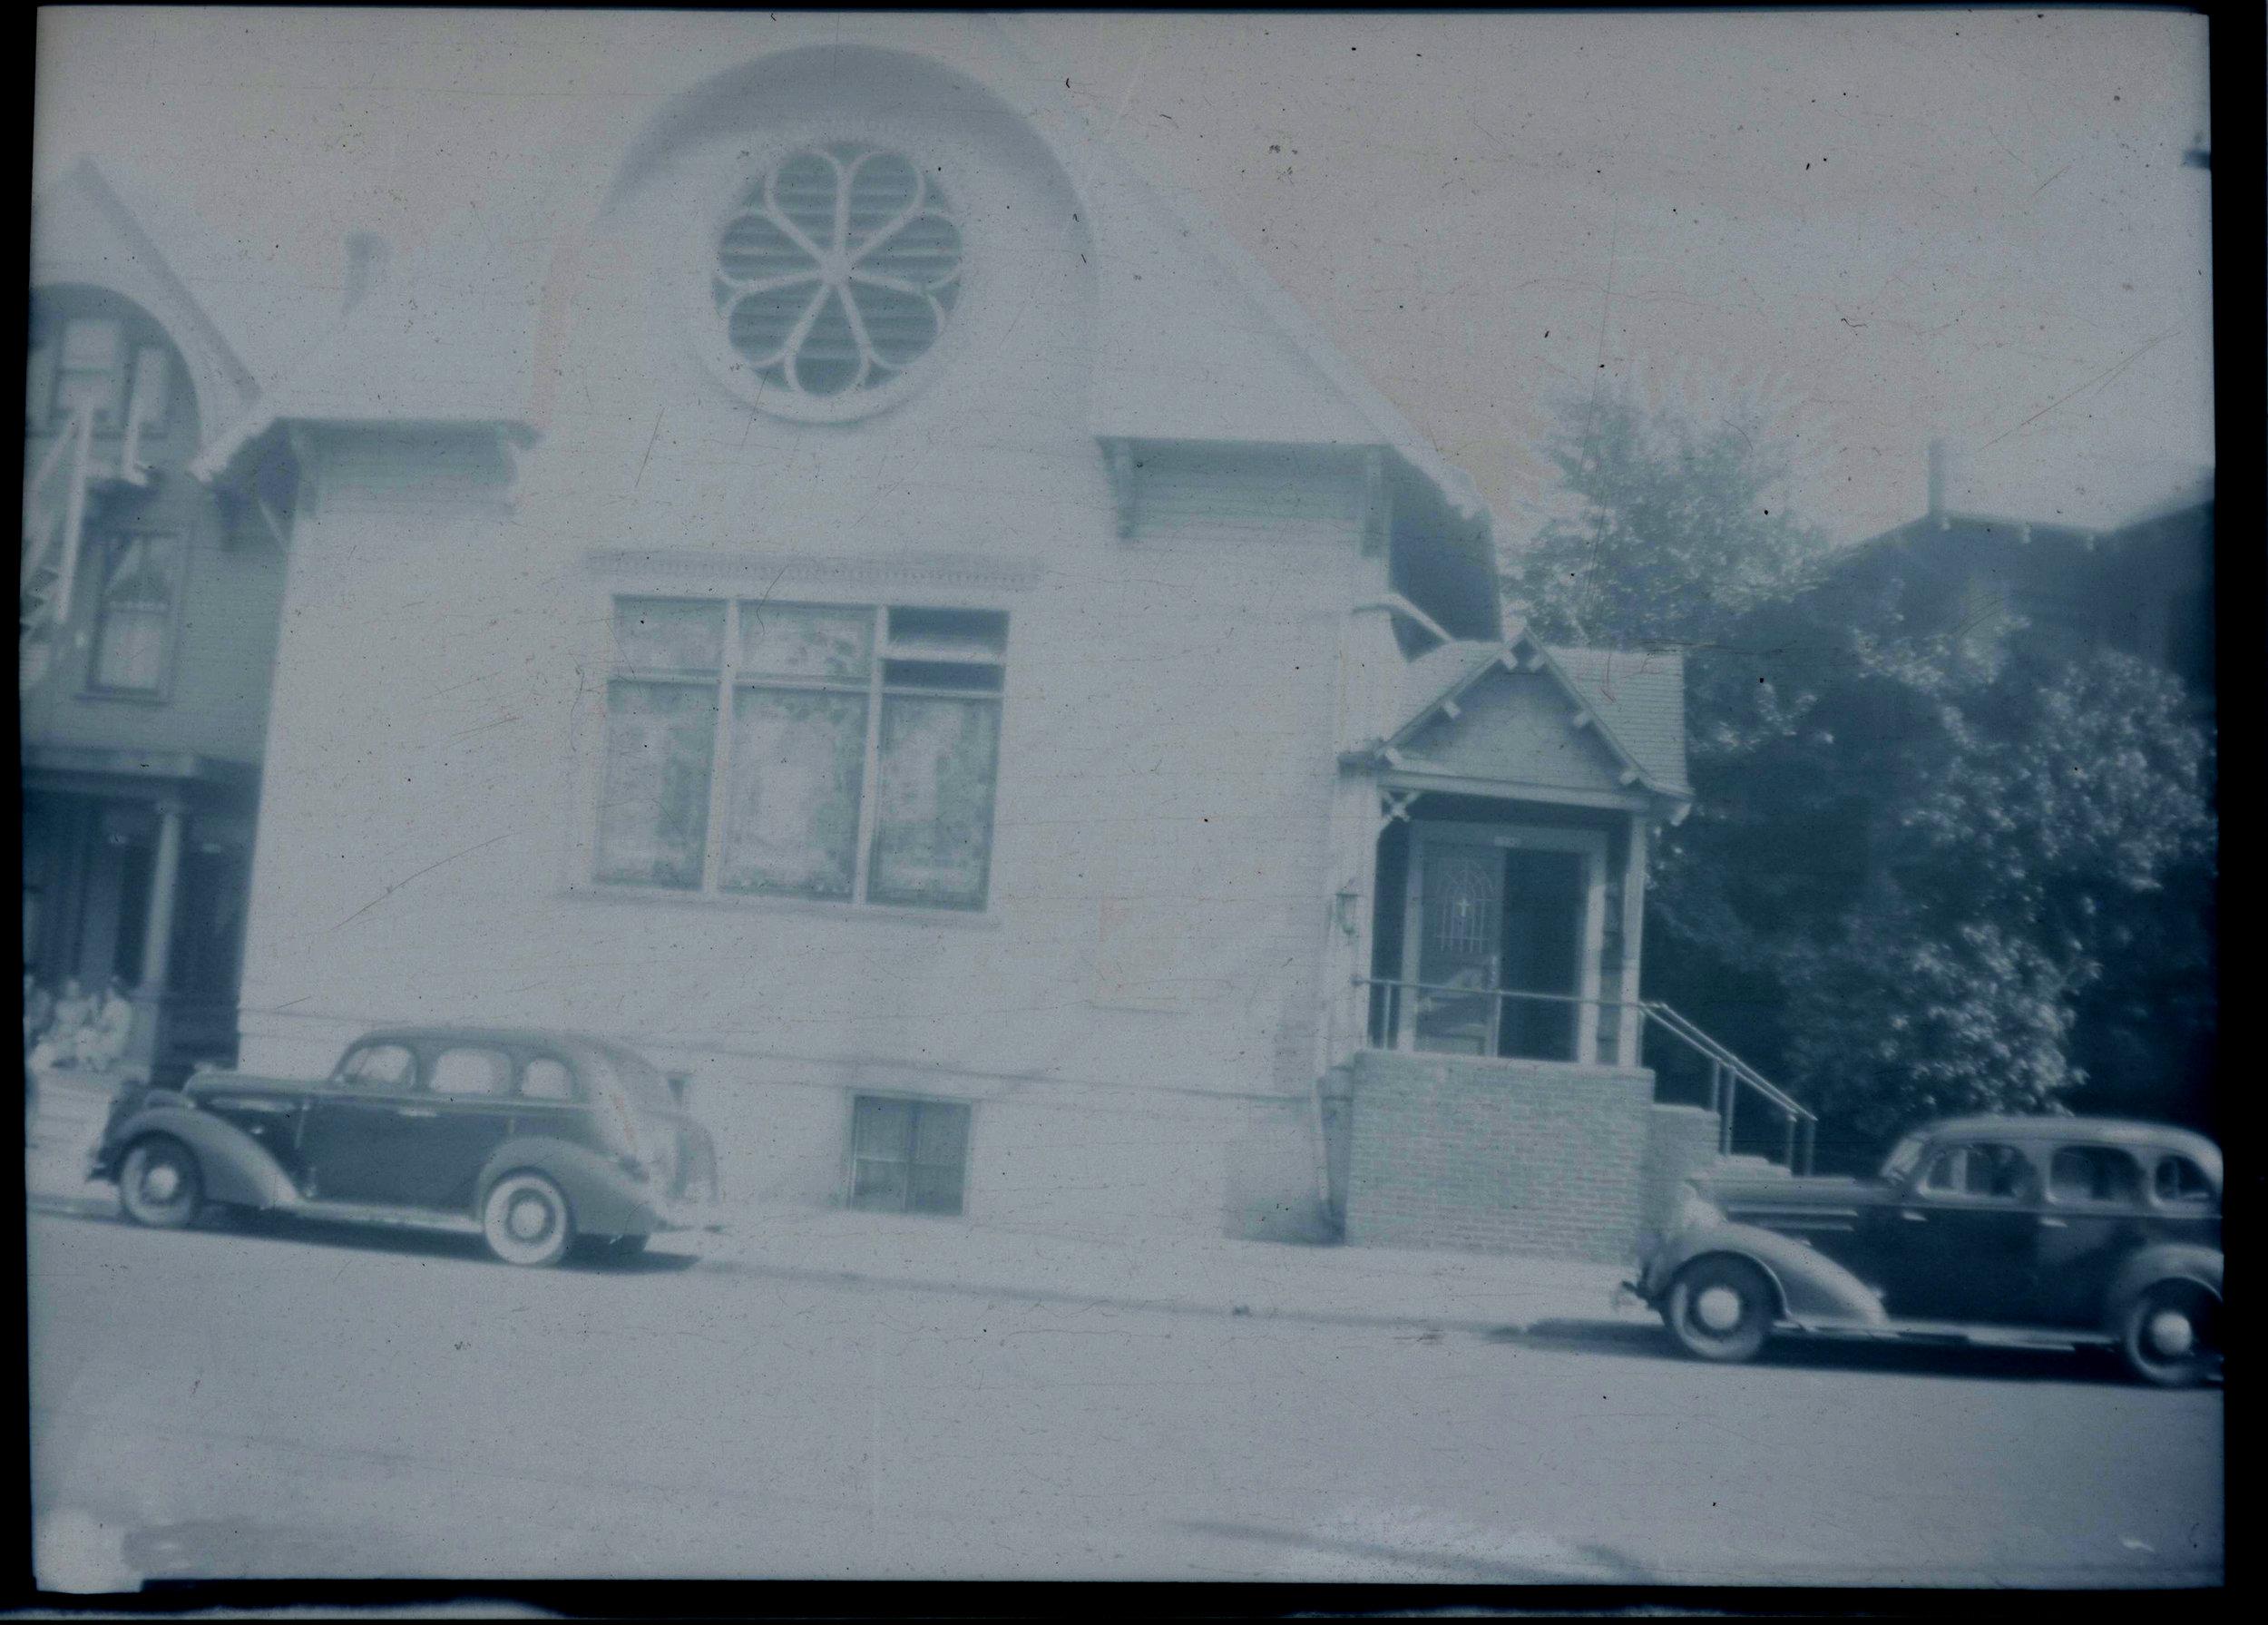 Portland Advent Christian Church